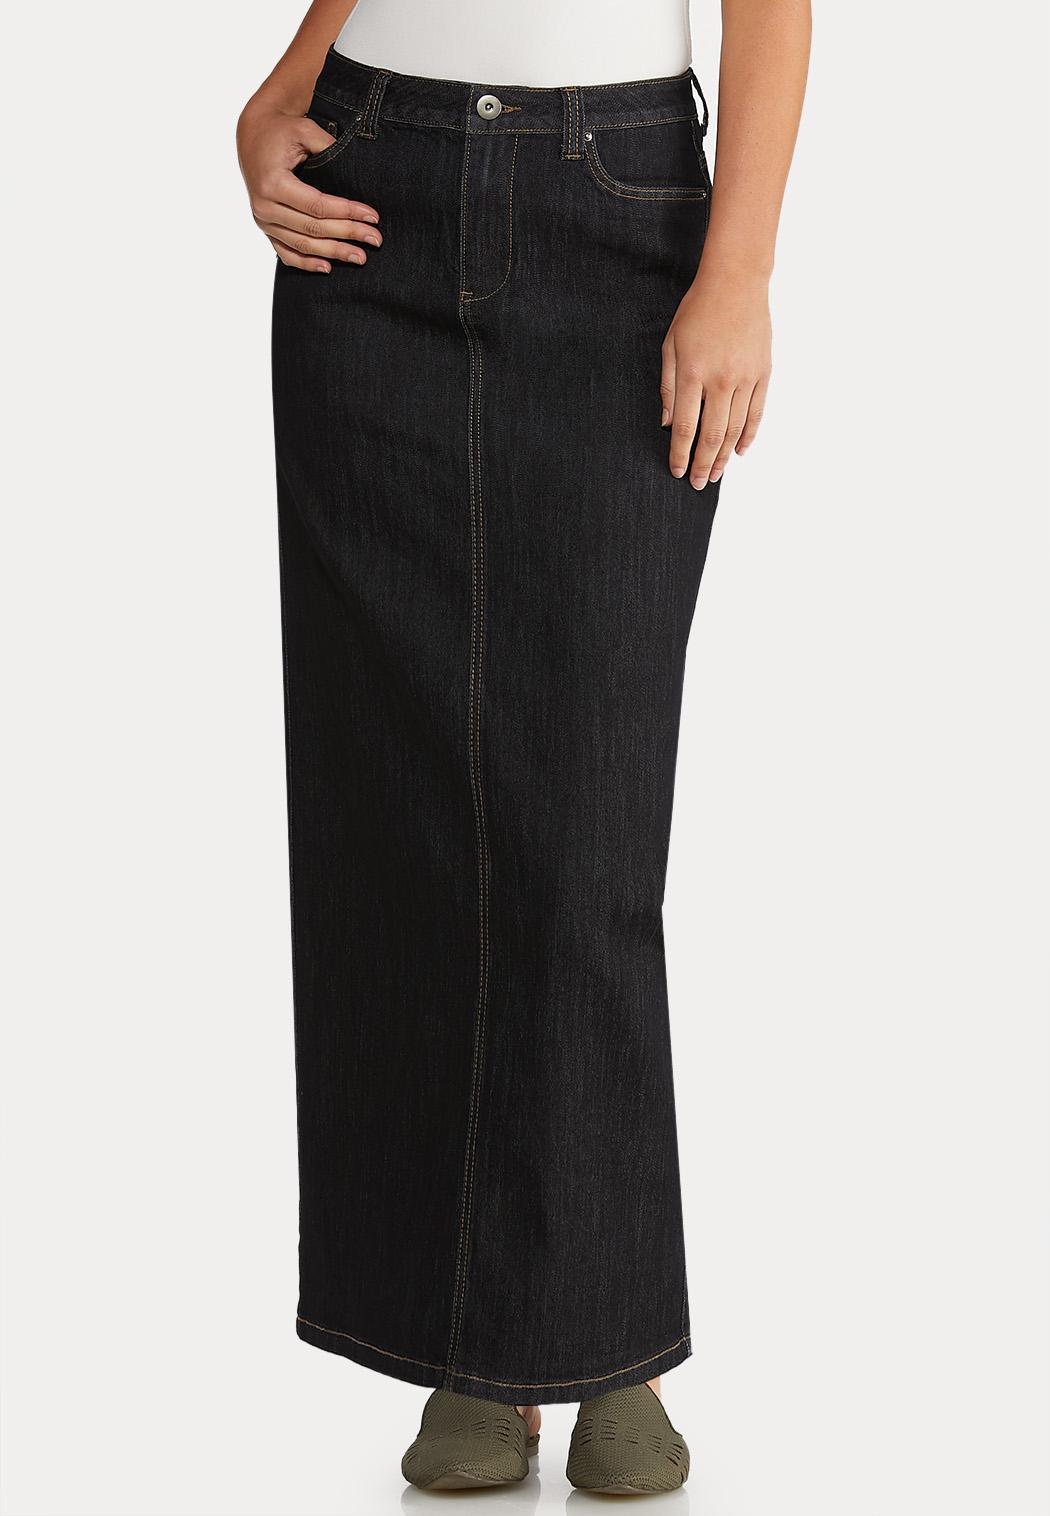 Rinse Denim Maxi Skirt